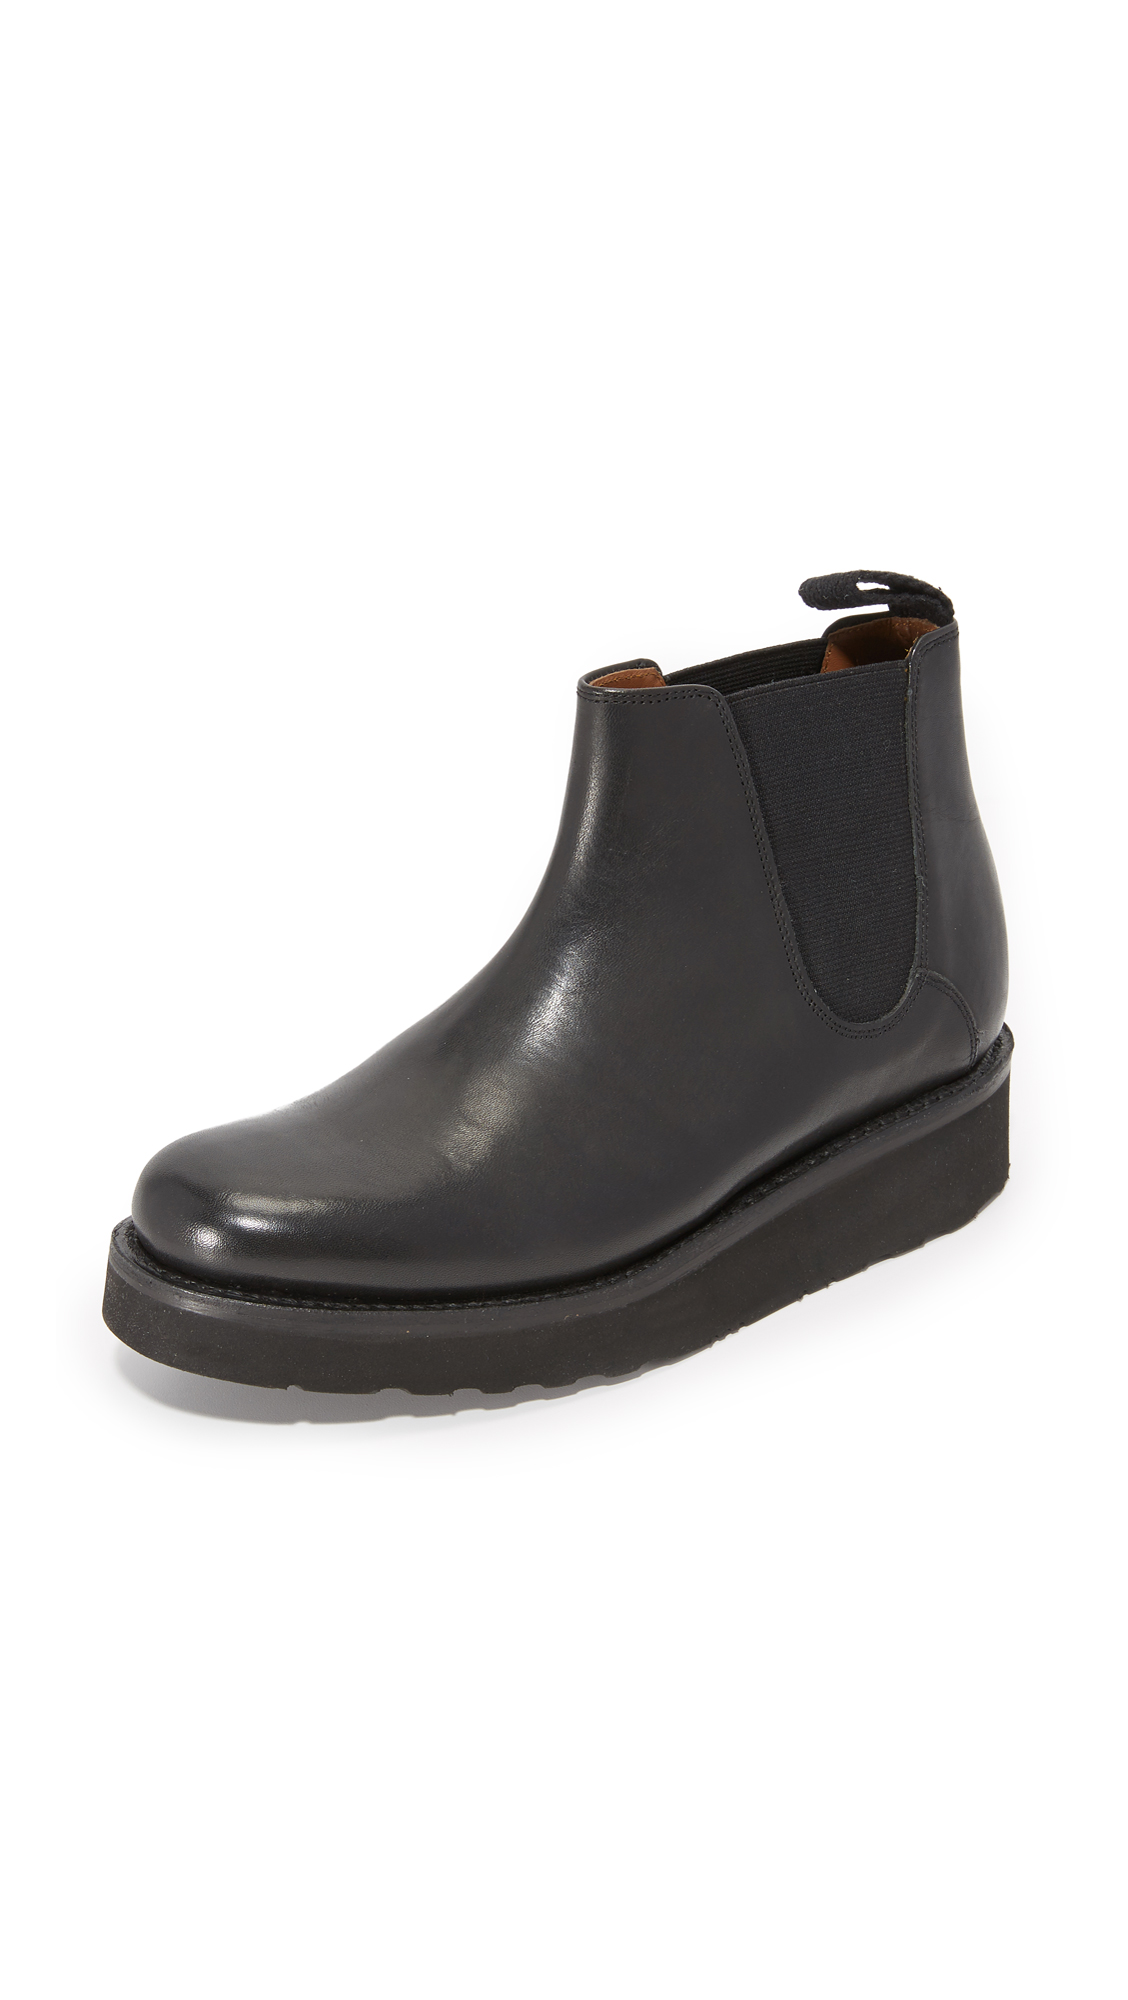 Grenson Lydia Platform Booties - Black